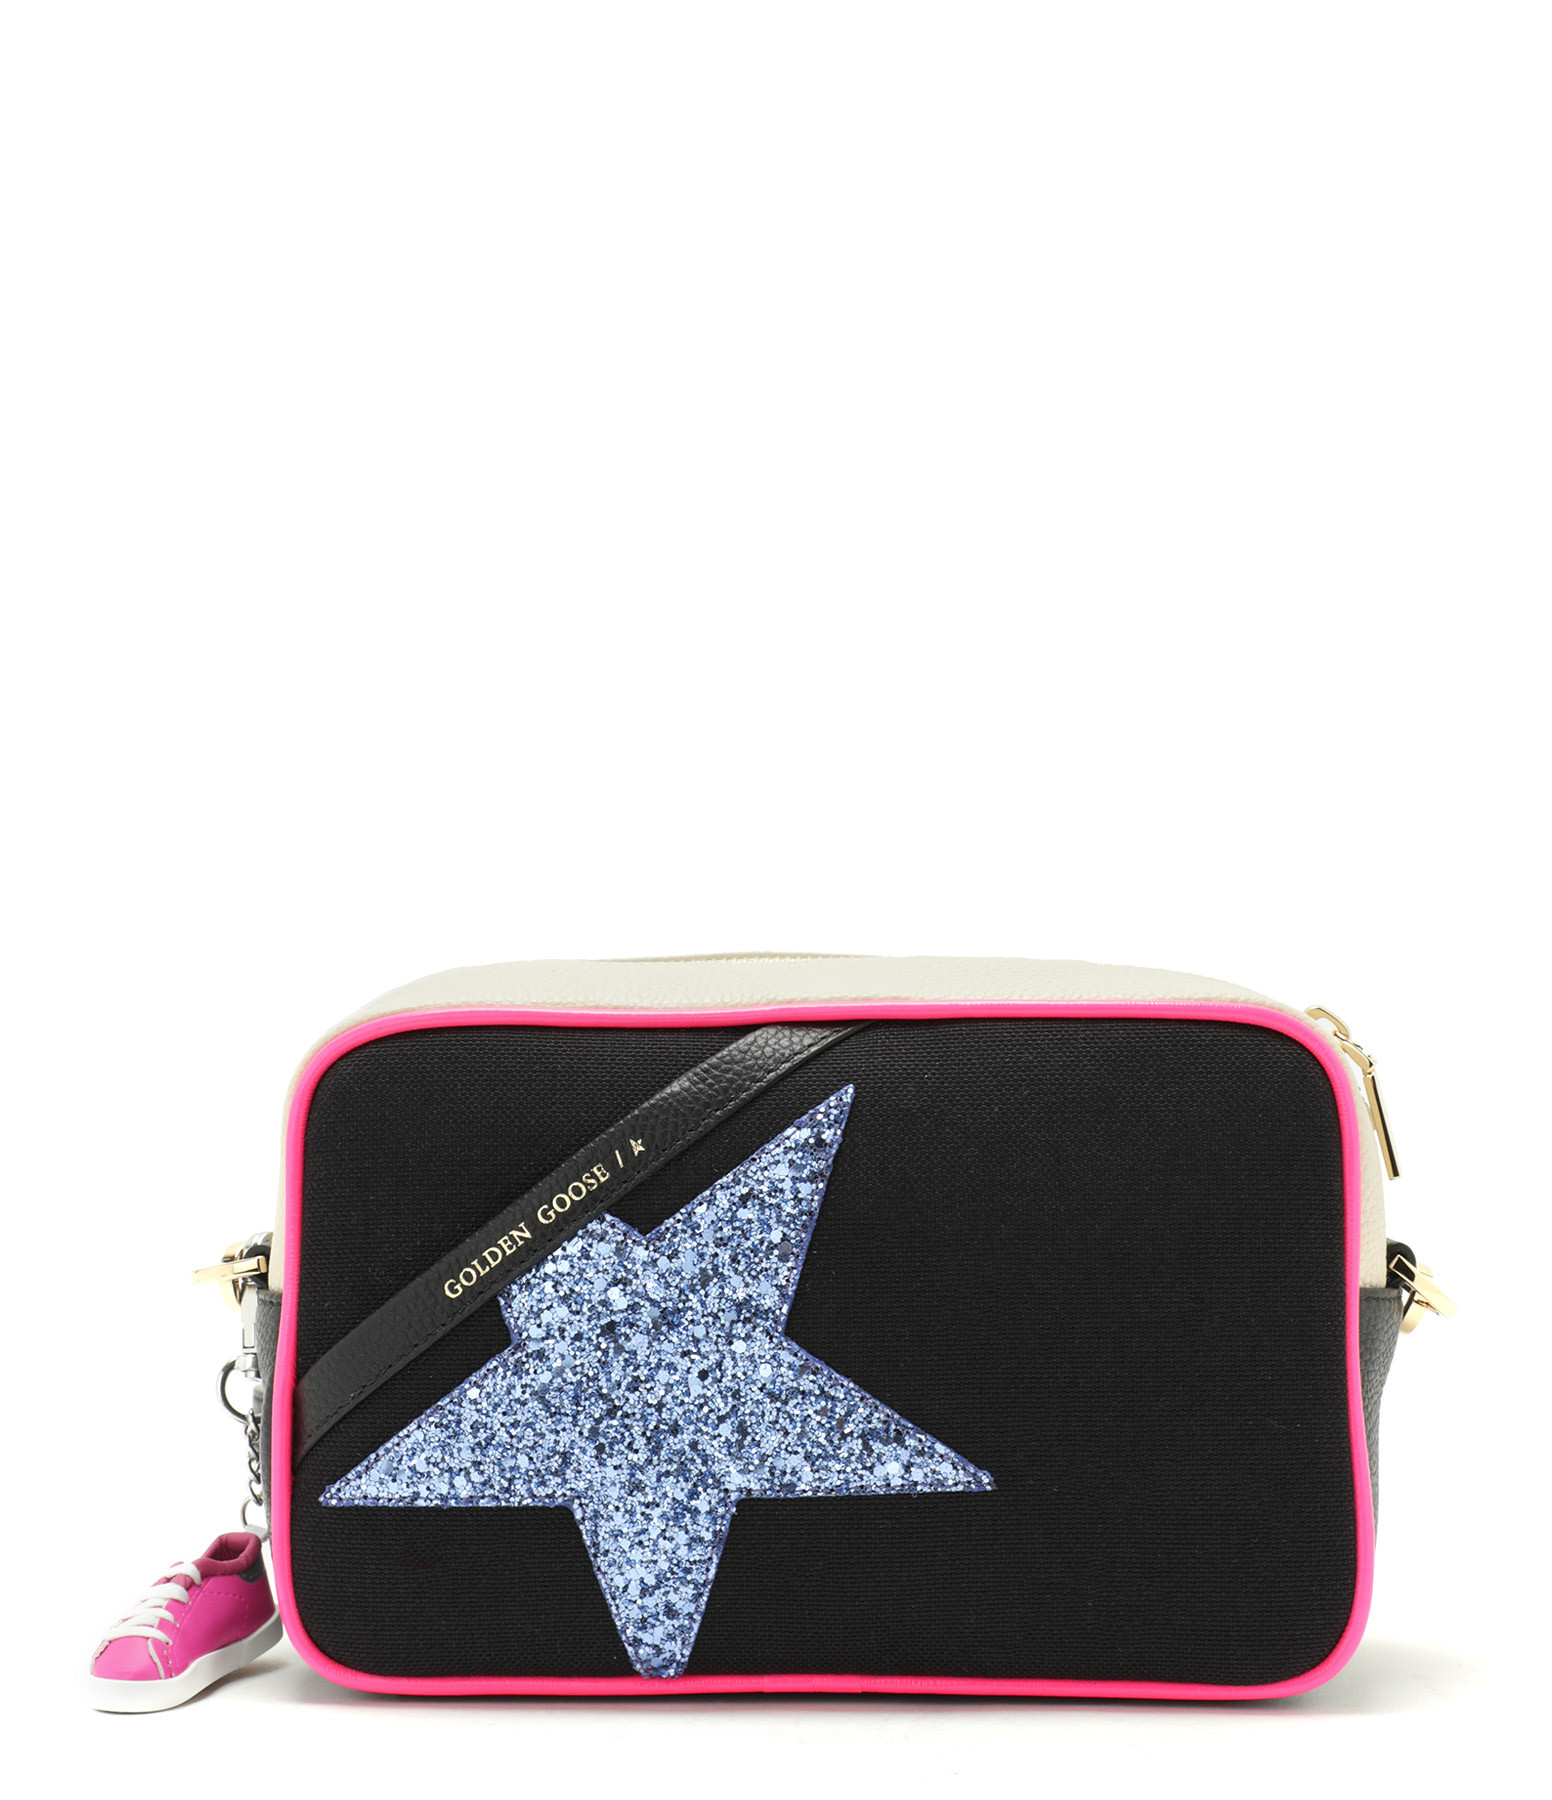 GOLDEN GOOSE - Sac Star Cuir Canvas Glitter Violet Noir